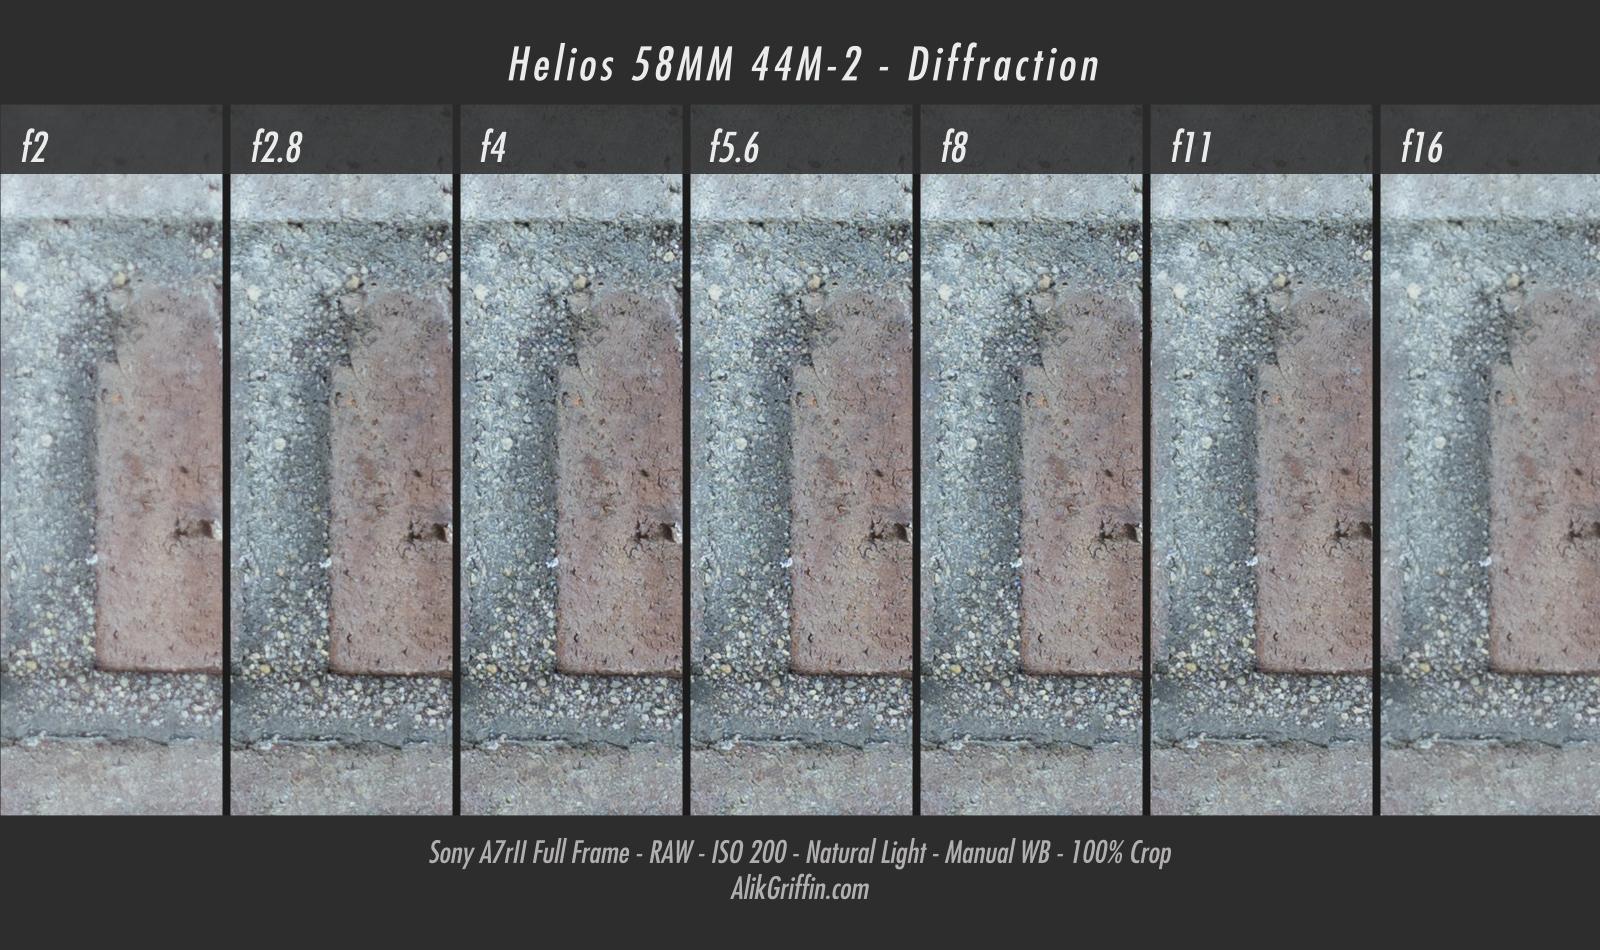 Helios 44-2 Diffraction Test